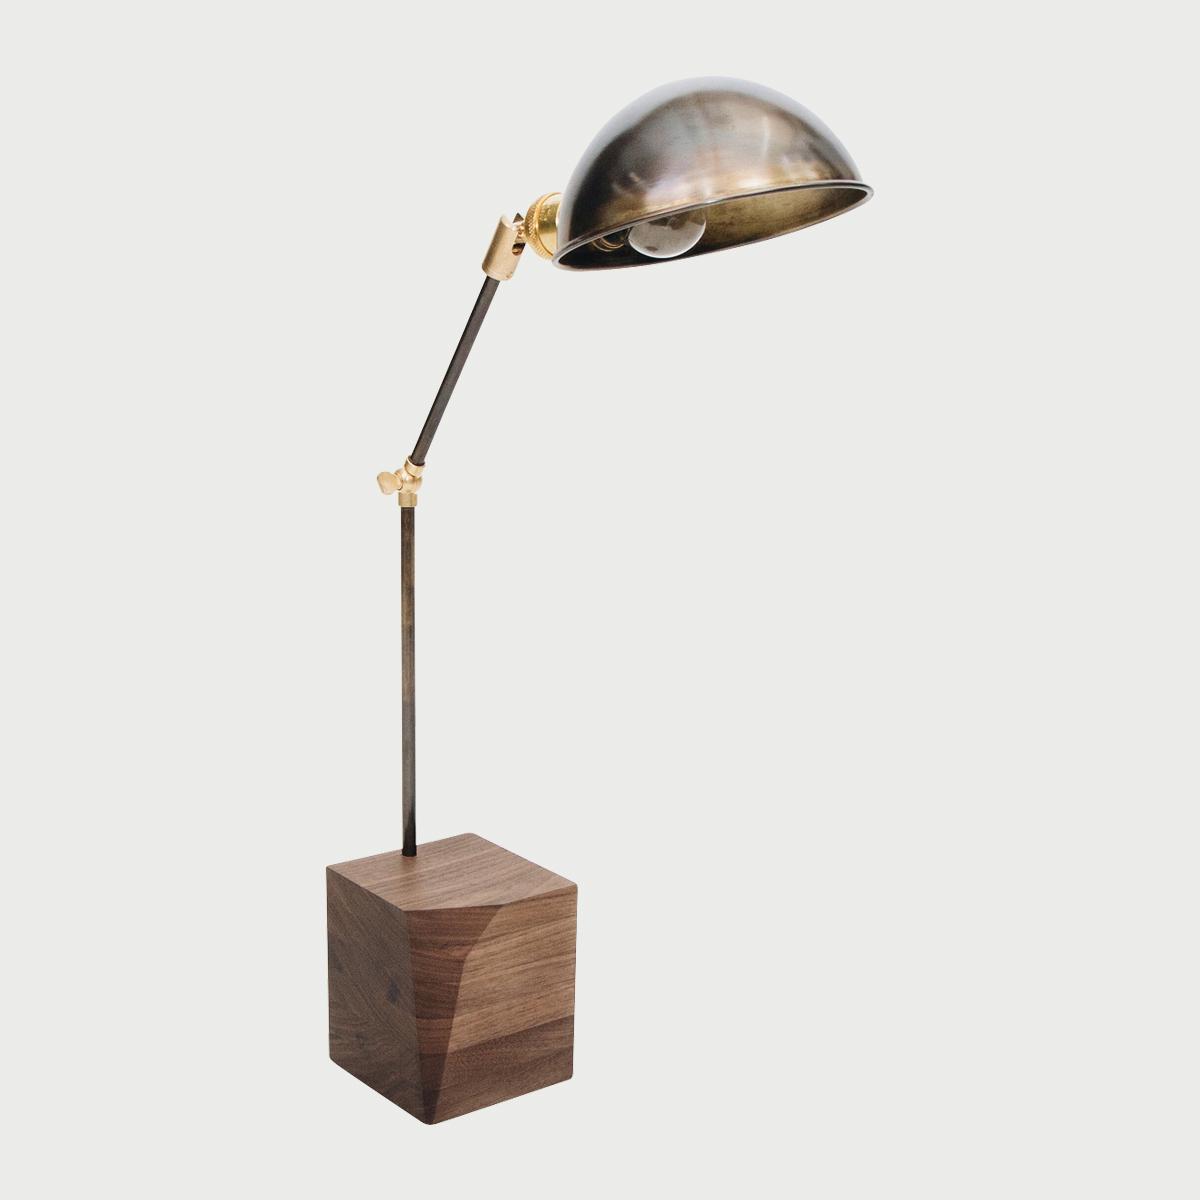 Atlas table lamp3 copy